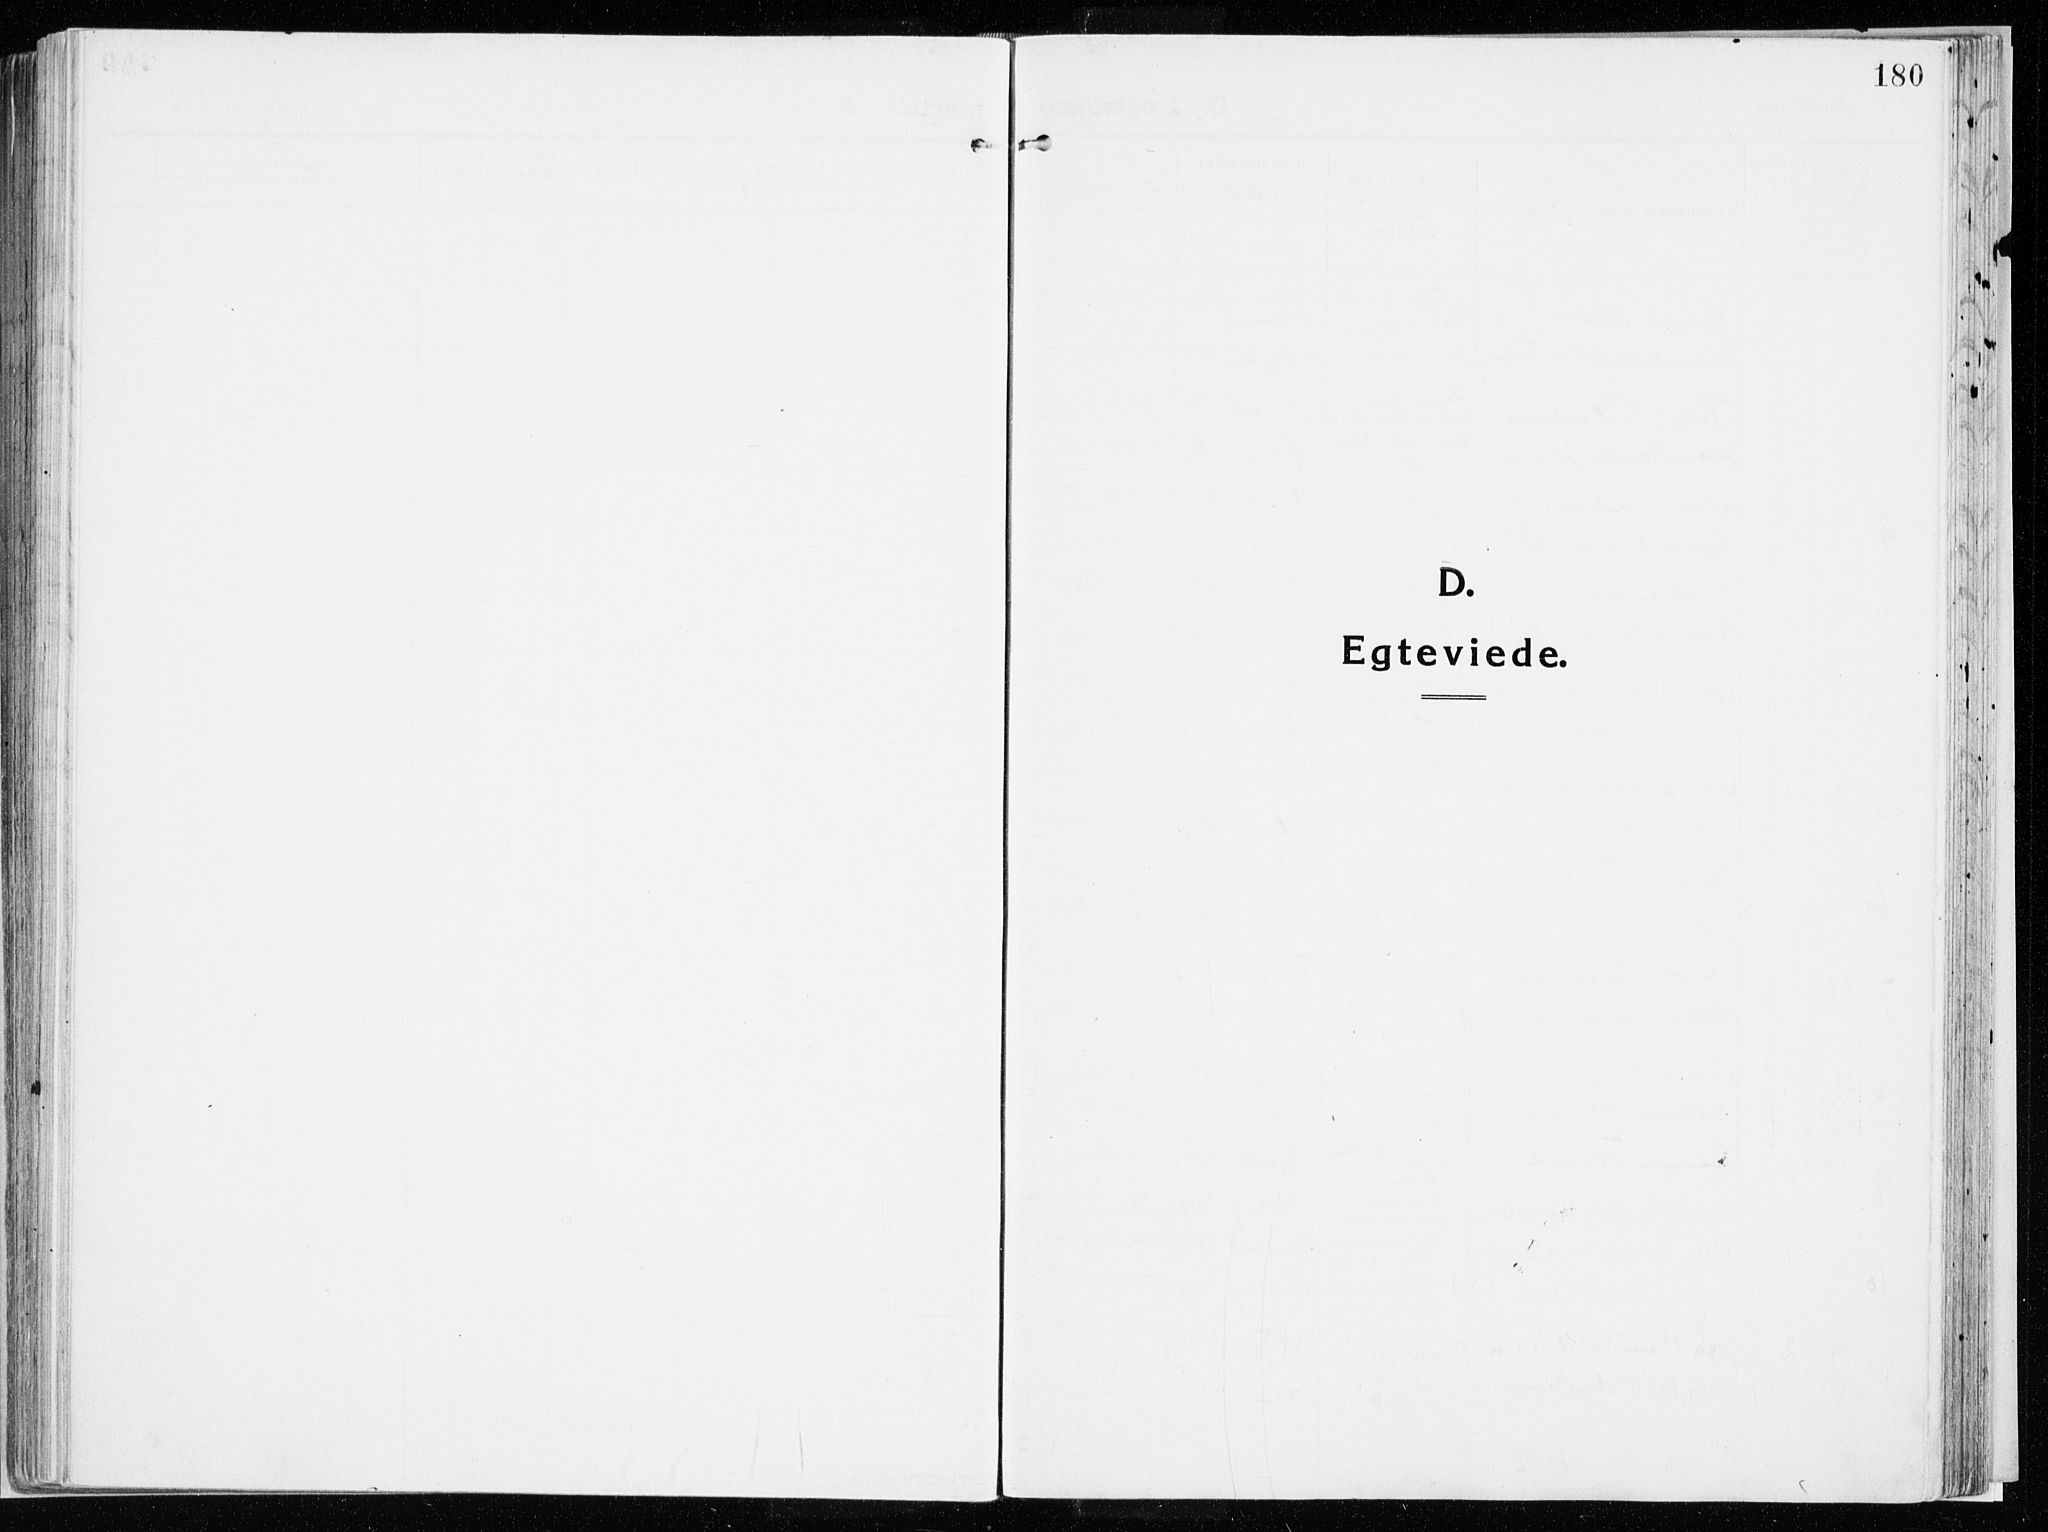 SAH, Vardal prestekontor, H/Ha/Haa/L0017: Ministerialbok nr. 17, 1915-1929, s. 180